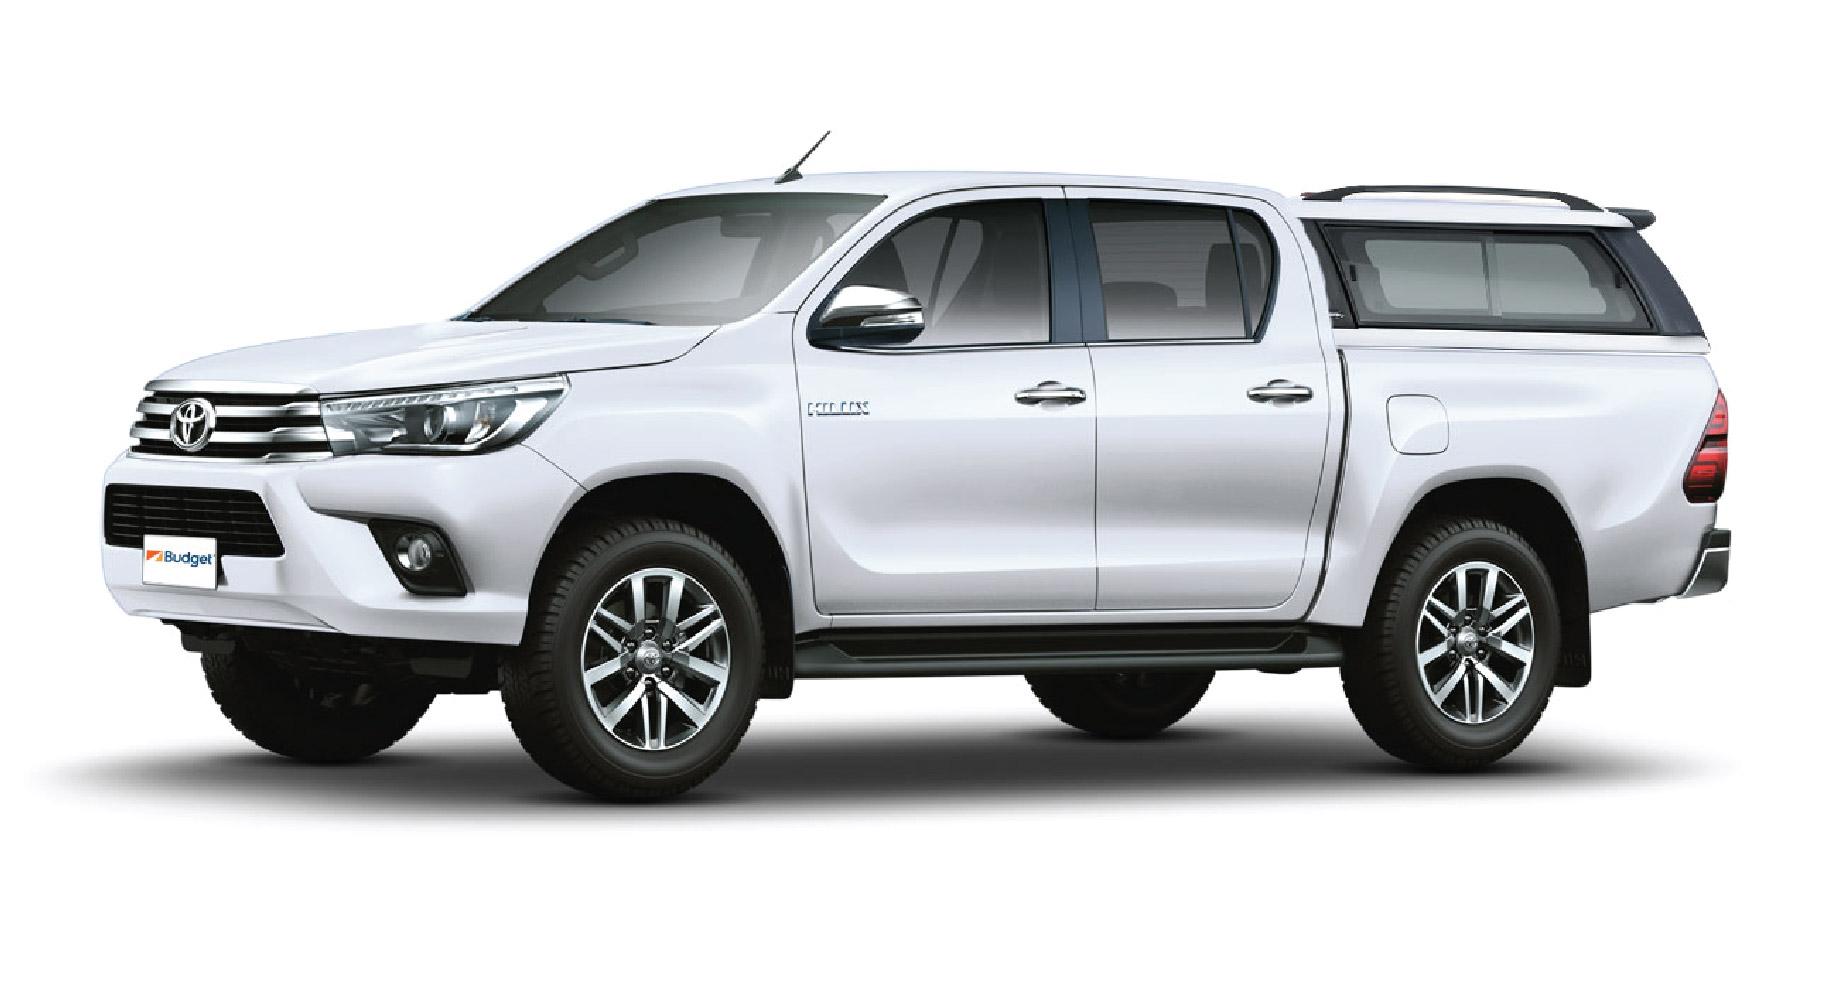 Toyota Revo Double Cab or similar